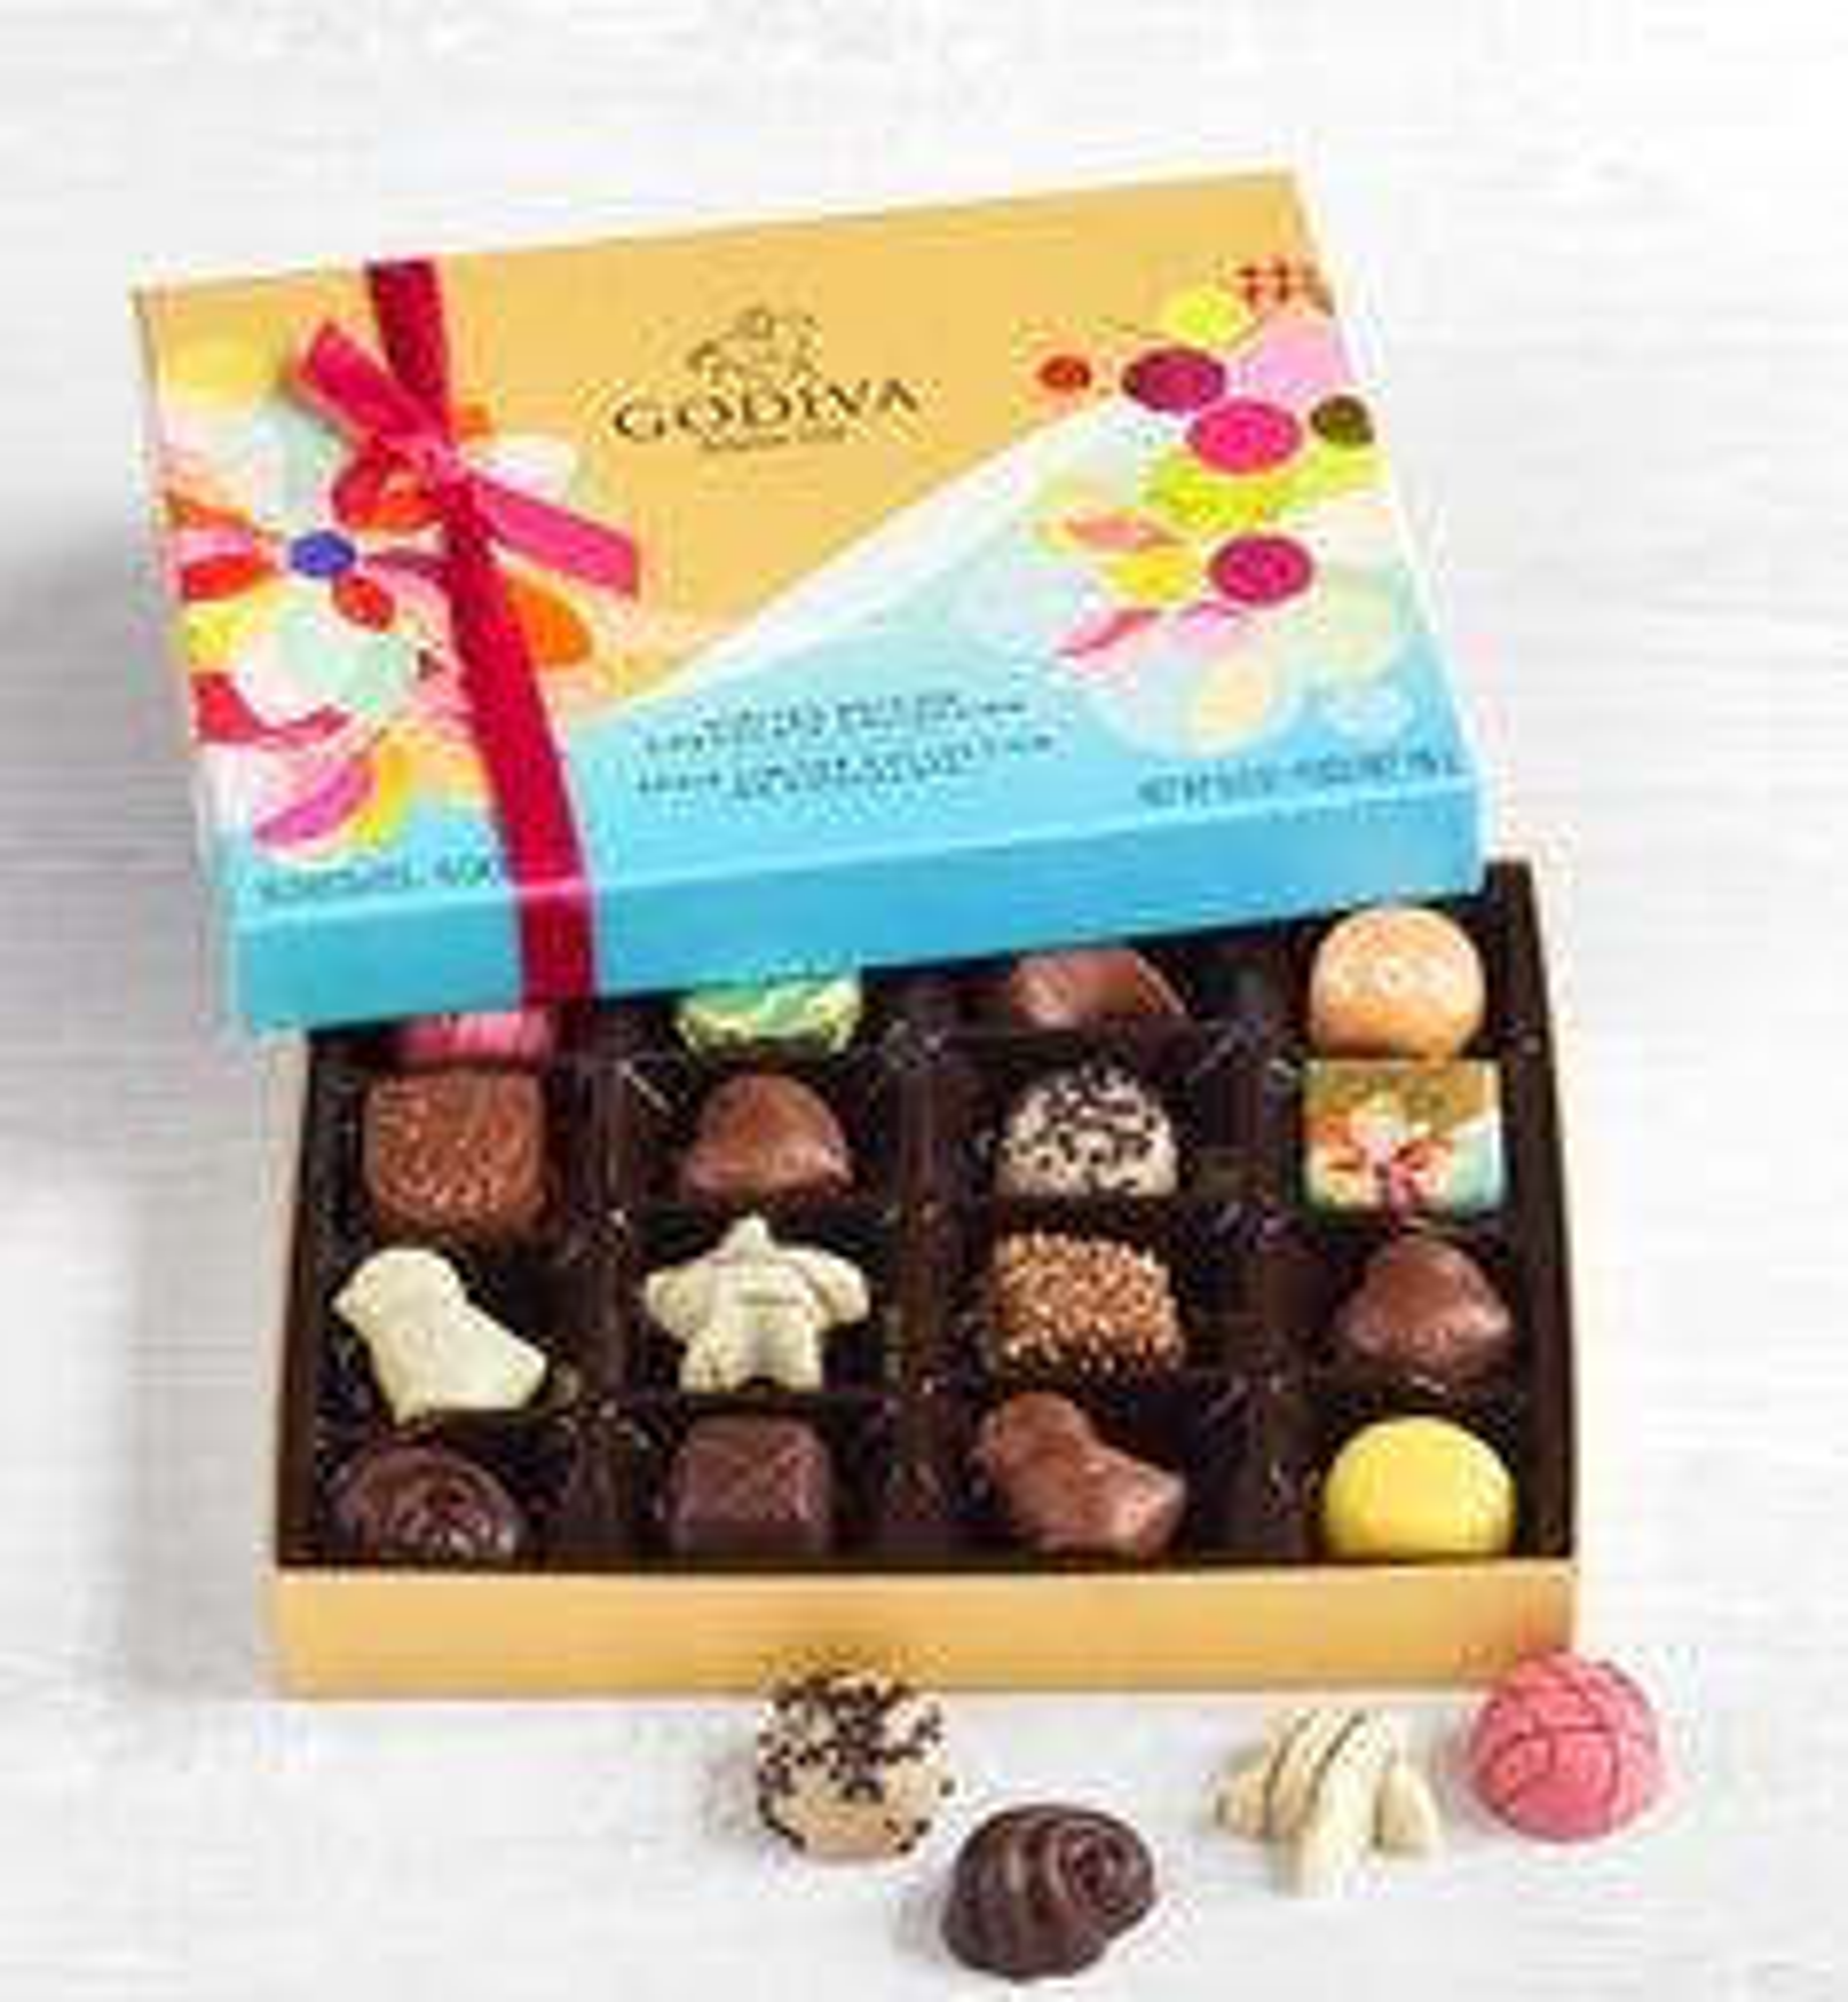 Godiva pc Limited Edition Chocolates  Truffles